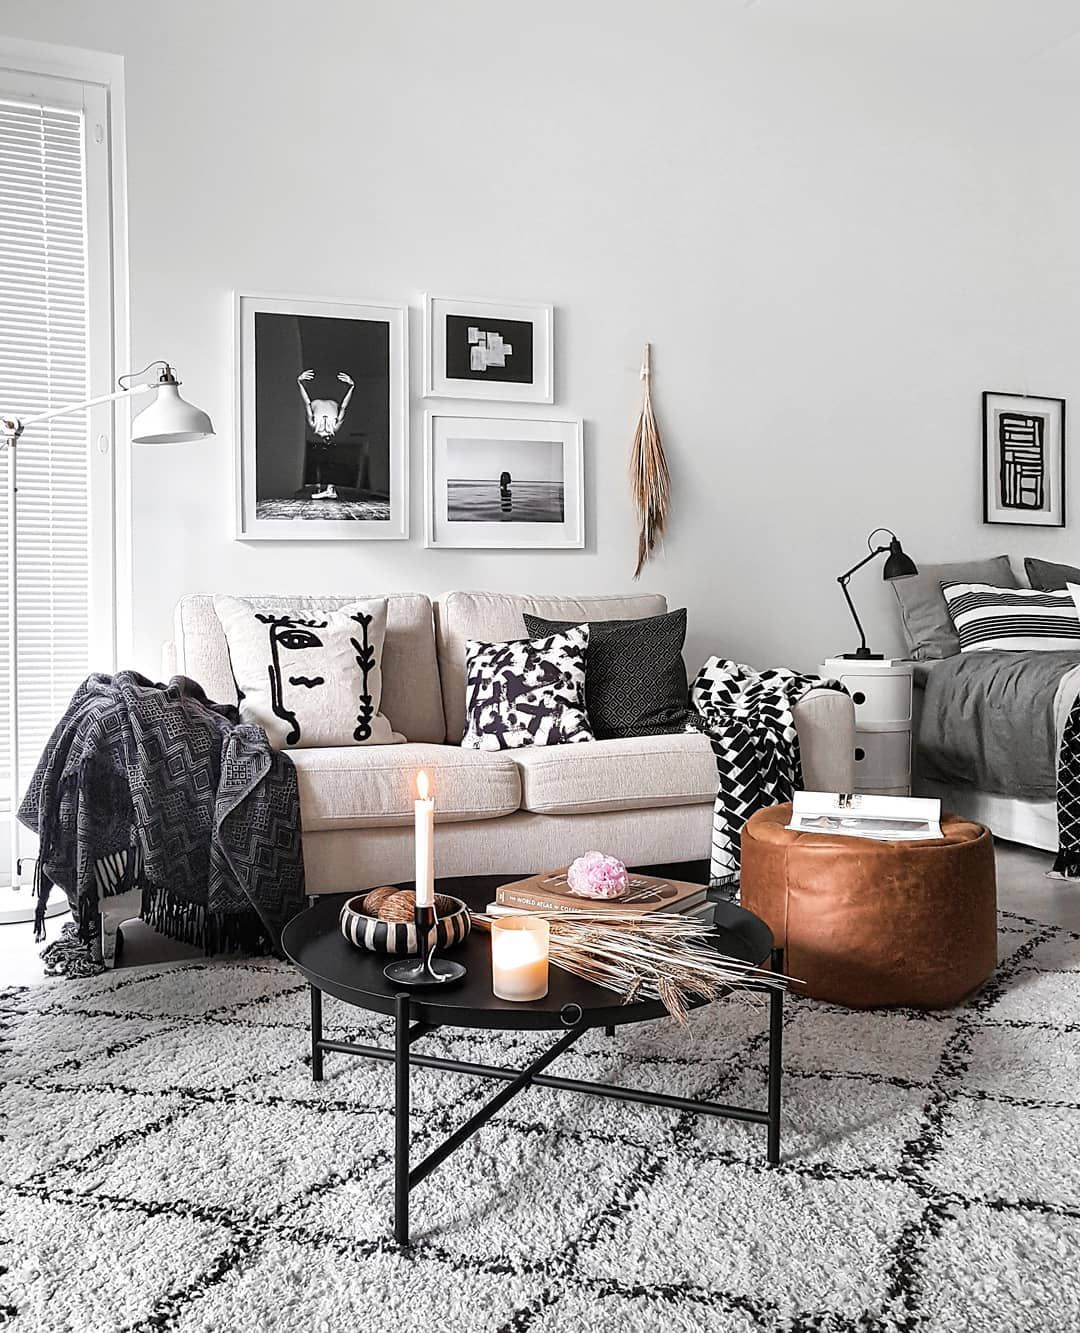 Provenance De La Photo Instagram Mk Nordic Interiordesign Interiors In 2020 Black Sofa Living Room Decor Minimalist Living Room Furniture Monochrome Living Room